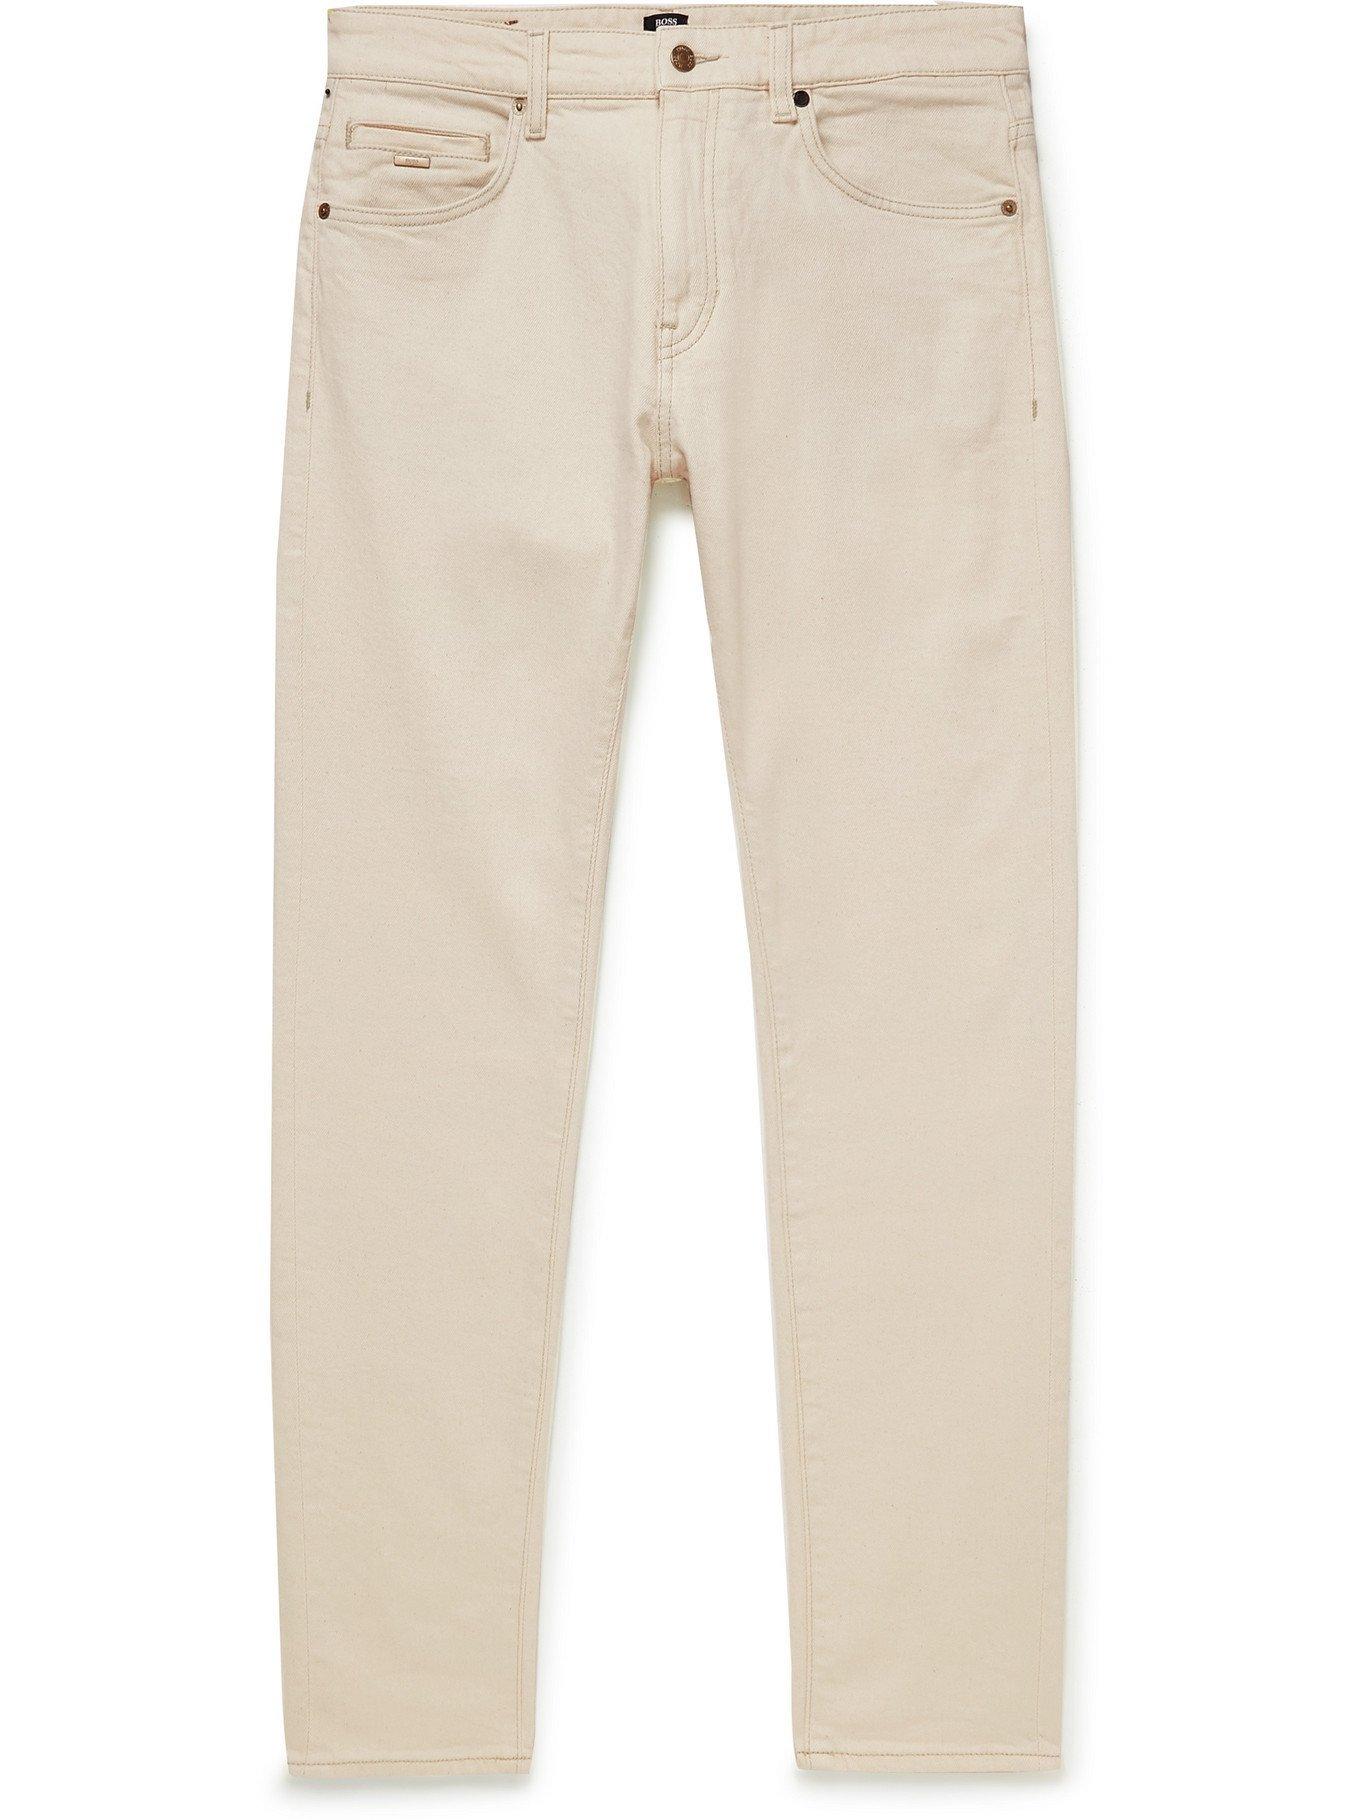 HUGO BOSS - Slim-Fit Tapered Stretch-Denim Jeans - Neutrals